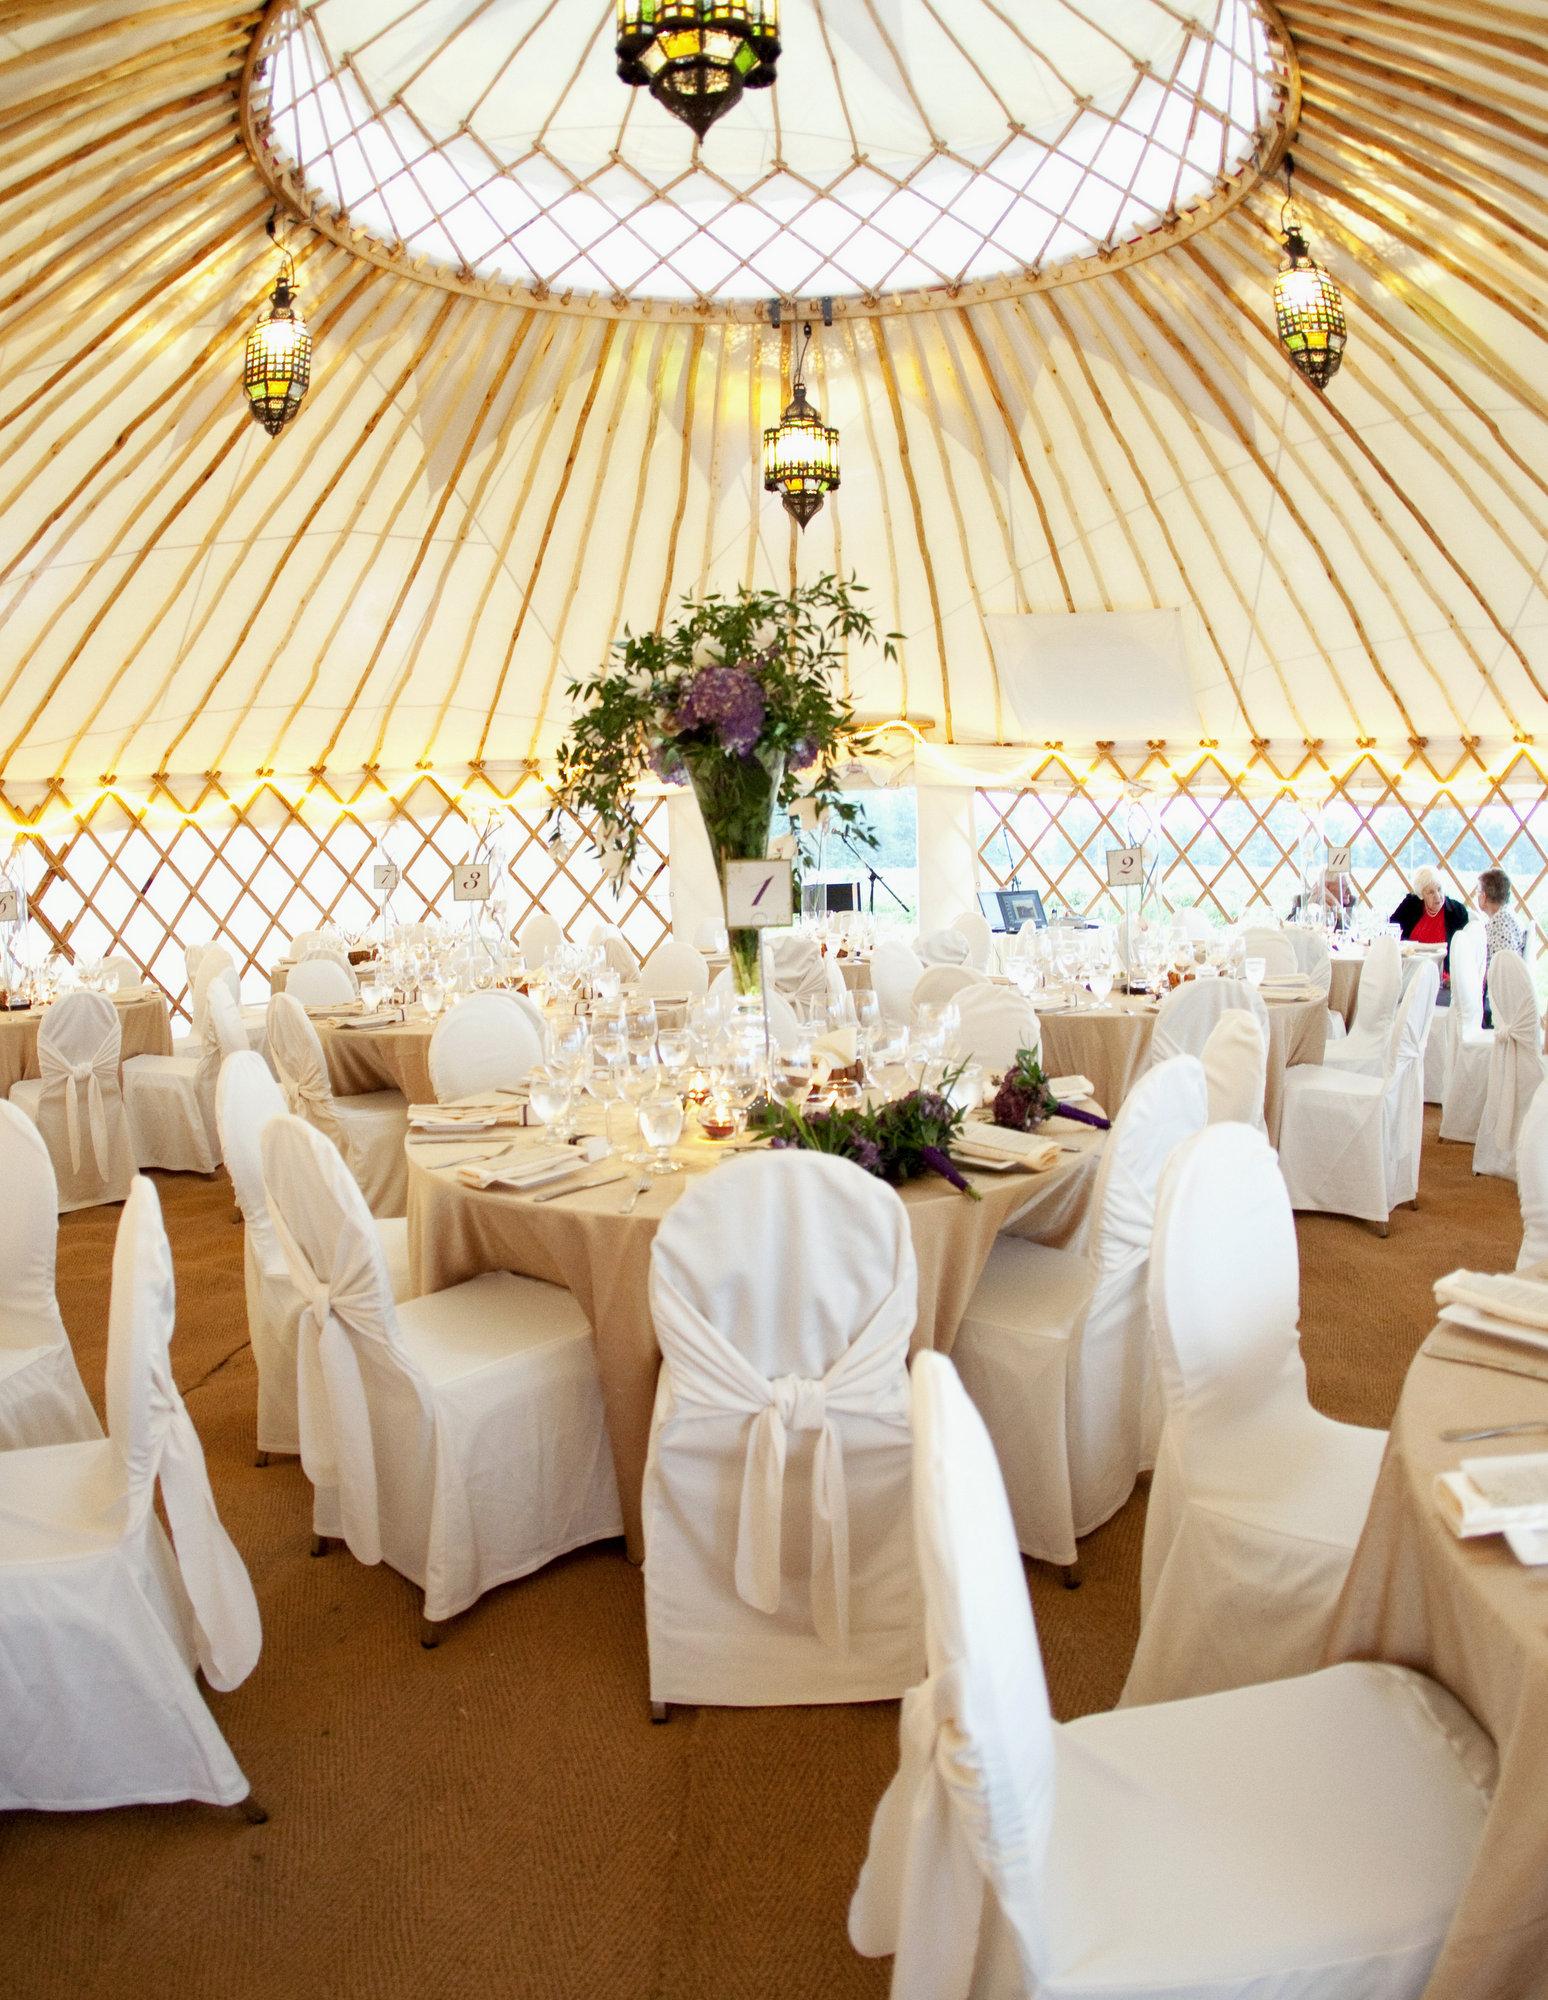 Elegant wedding reception in the Palace yurt